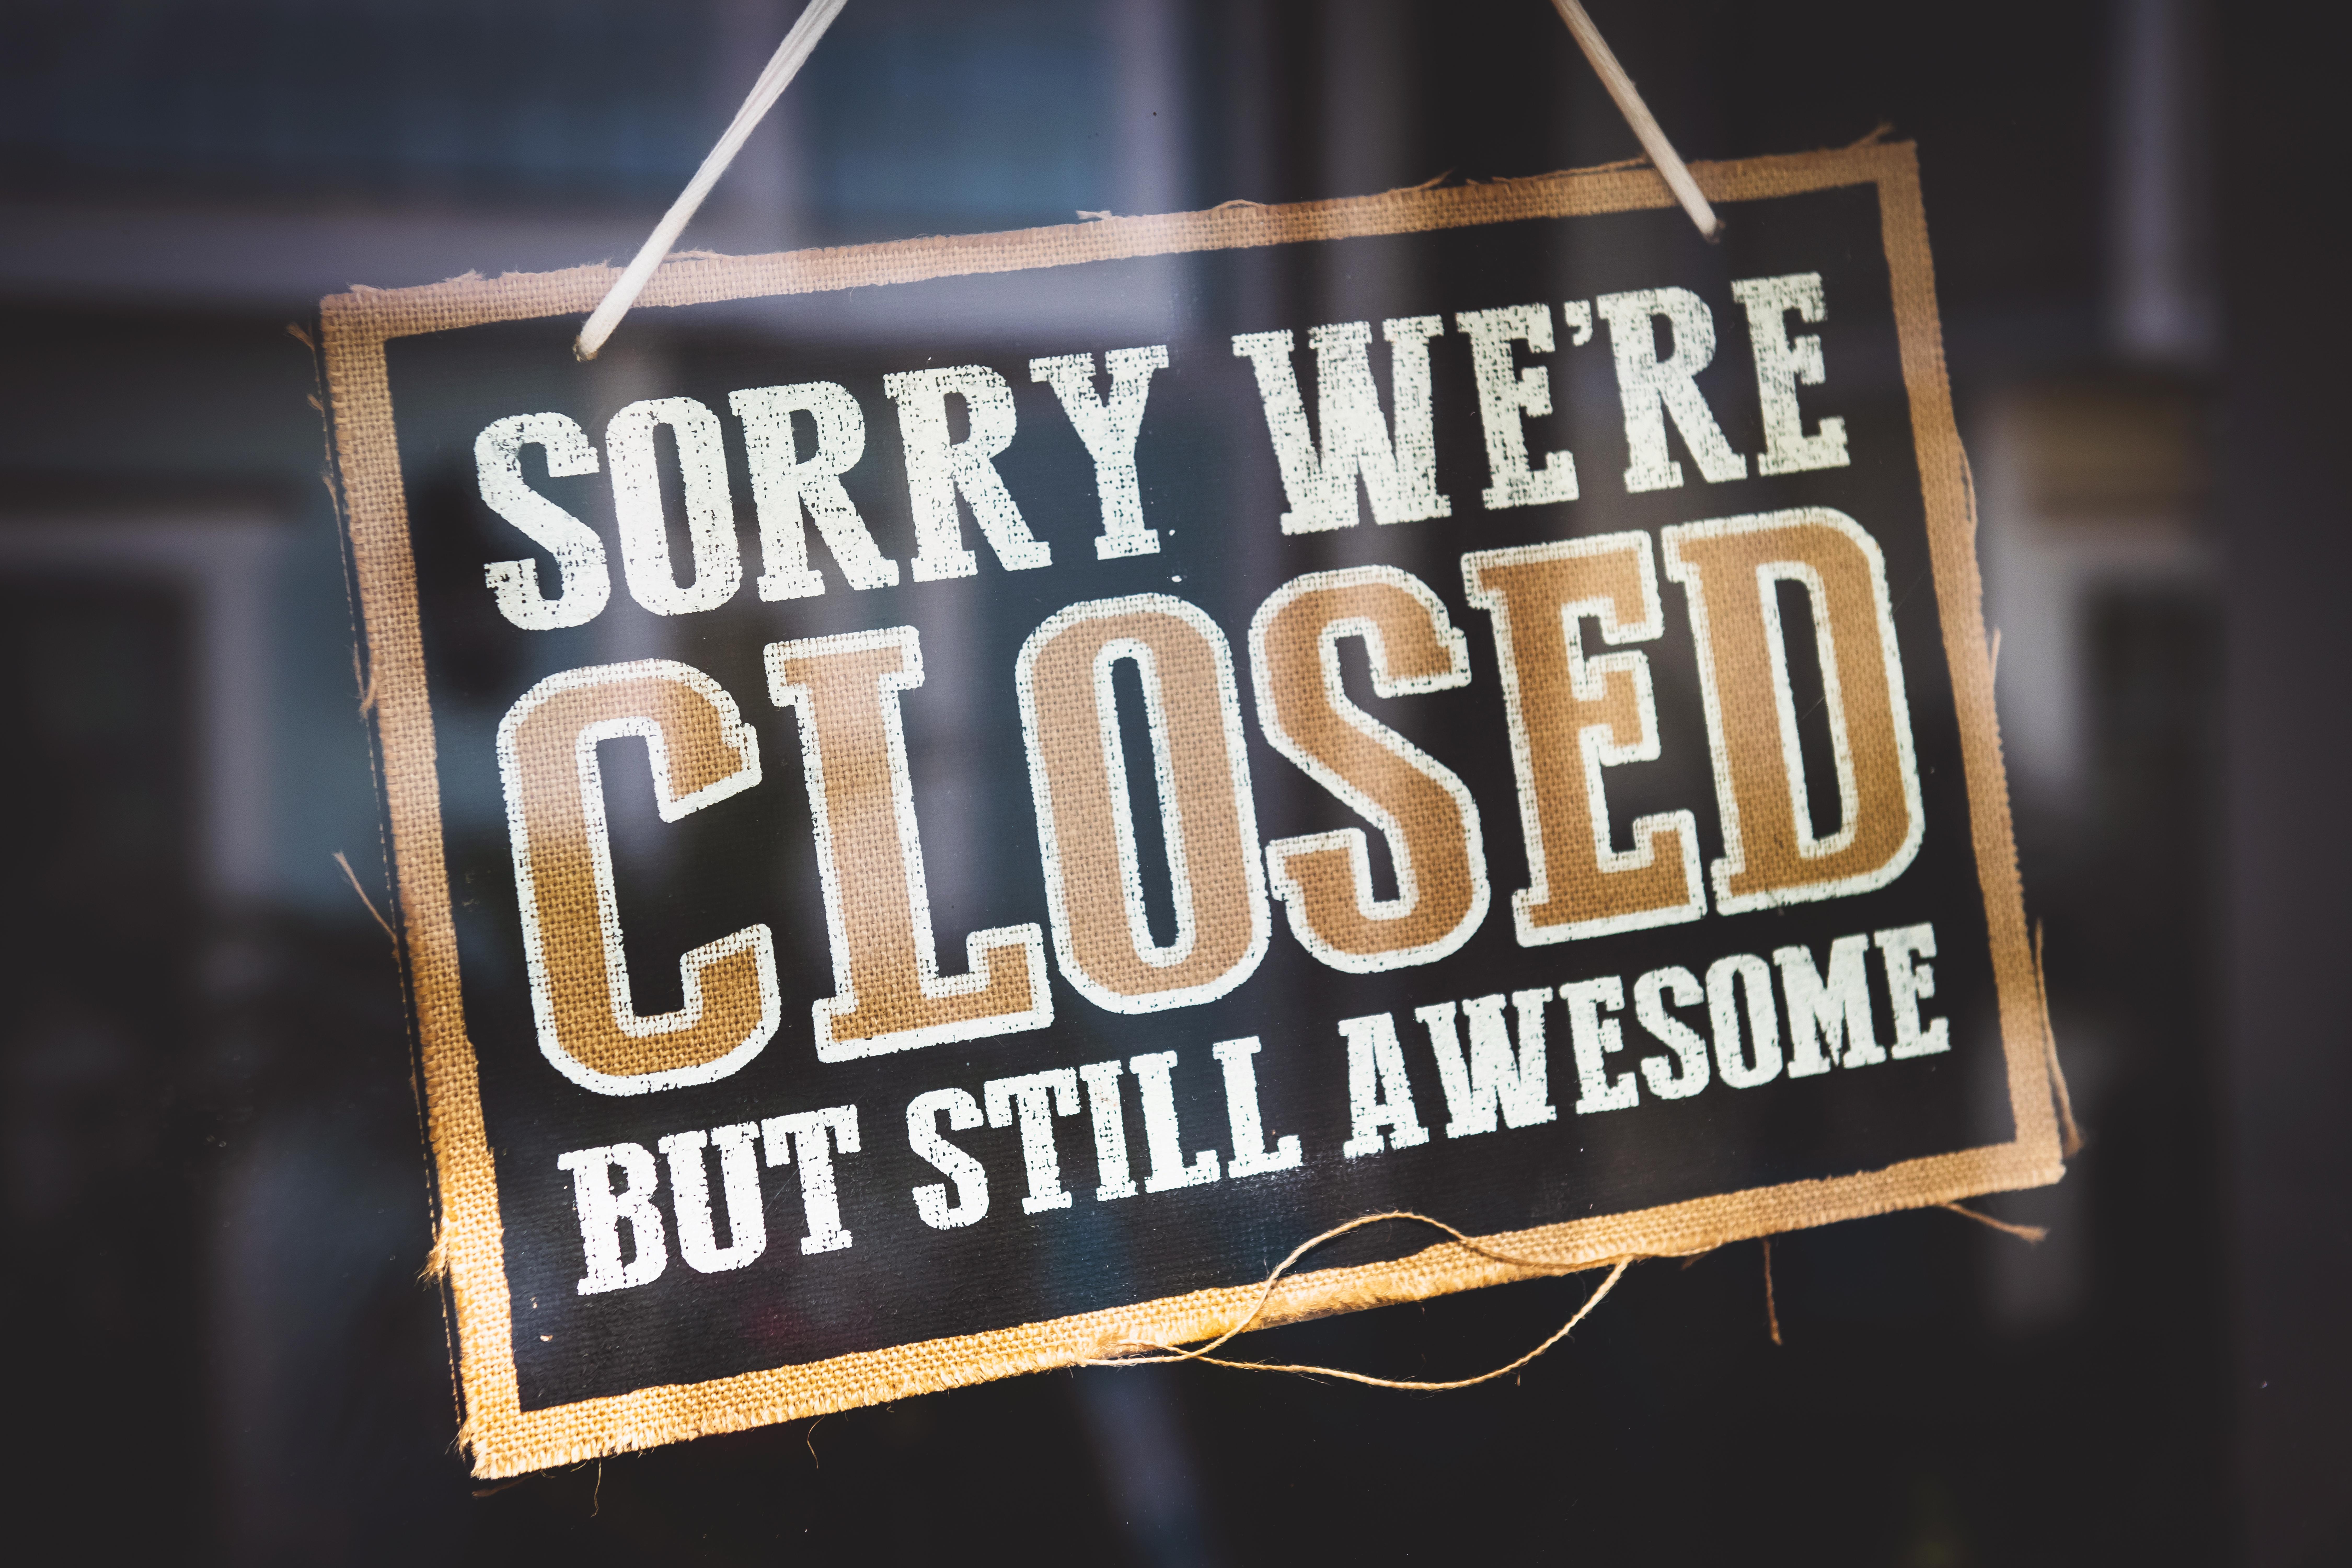 We Will Be Closed November 17, 2018